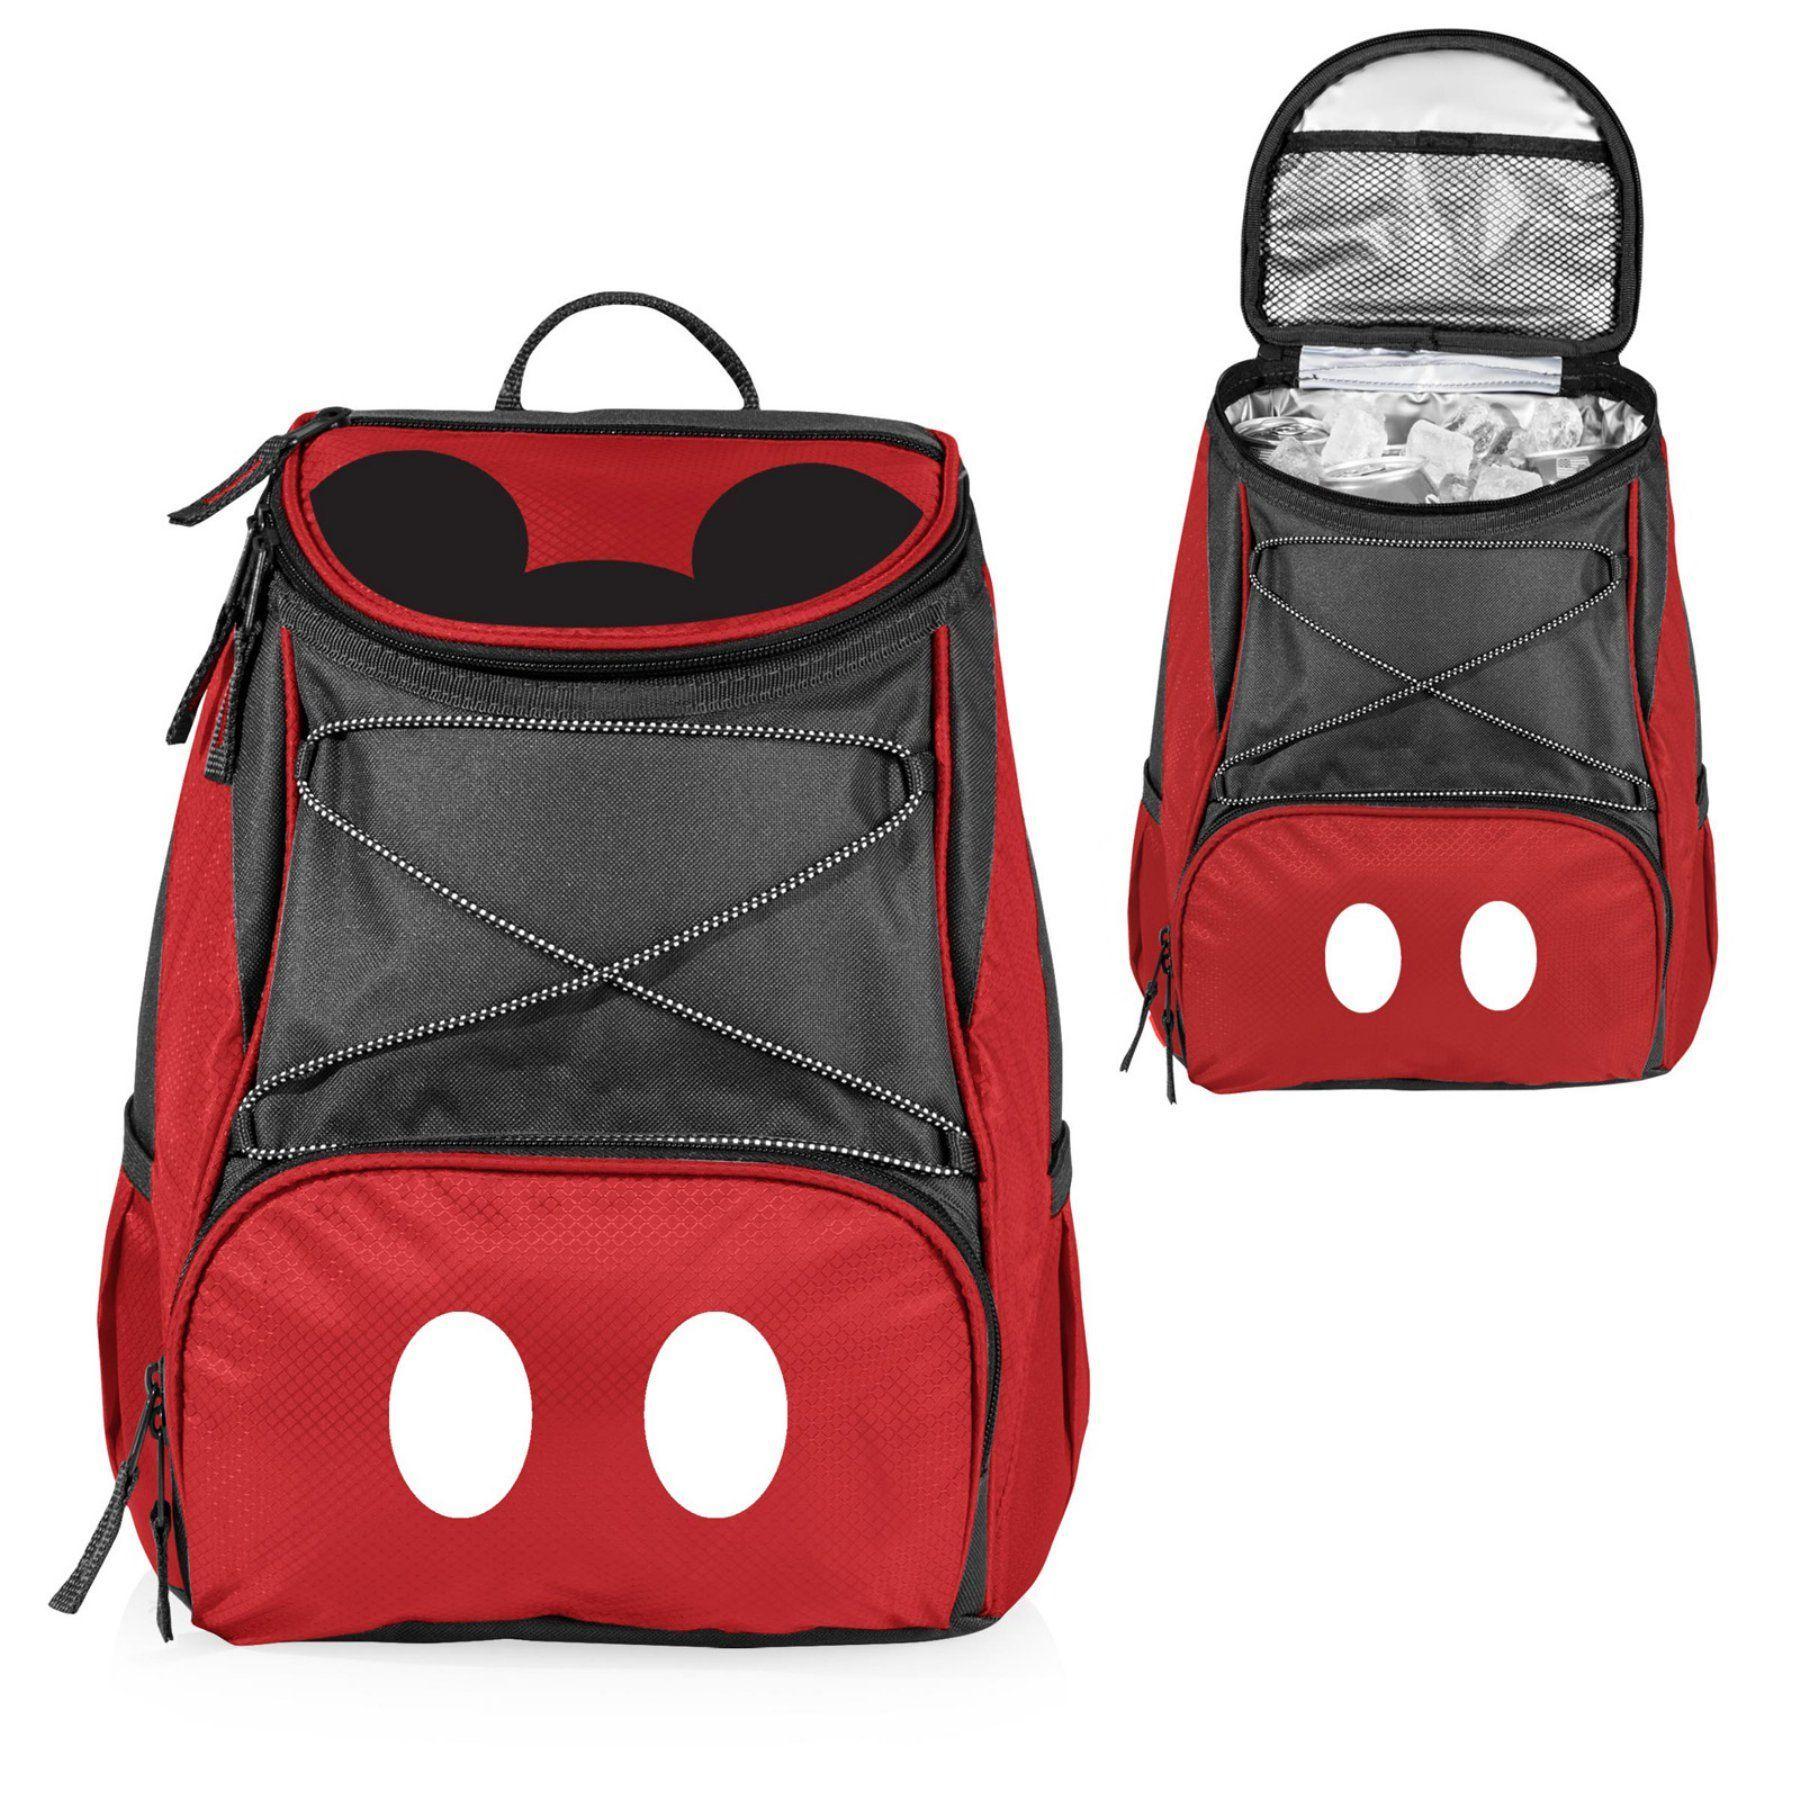 dde8599a9a2 Picnic Time Disney PTX Cooler Backpack - 633-00-100-044-11 ...